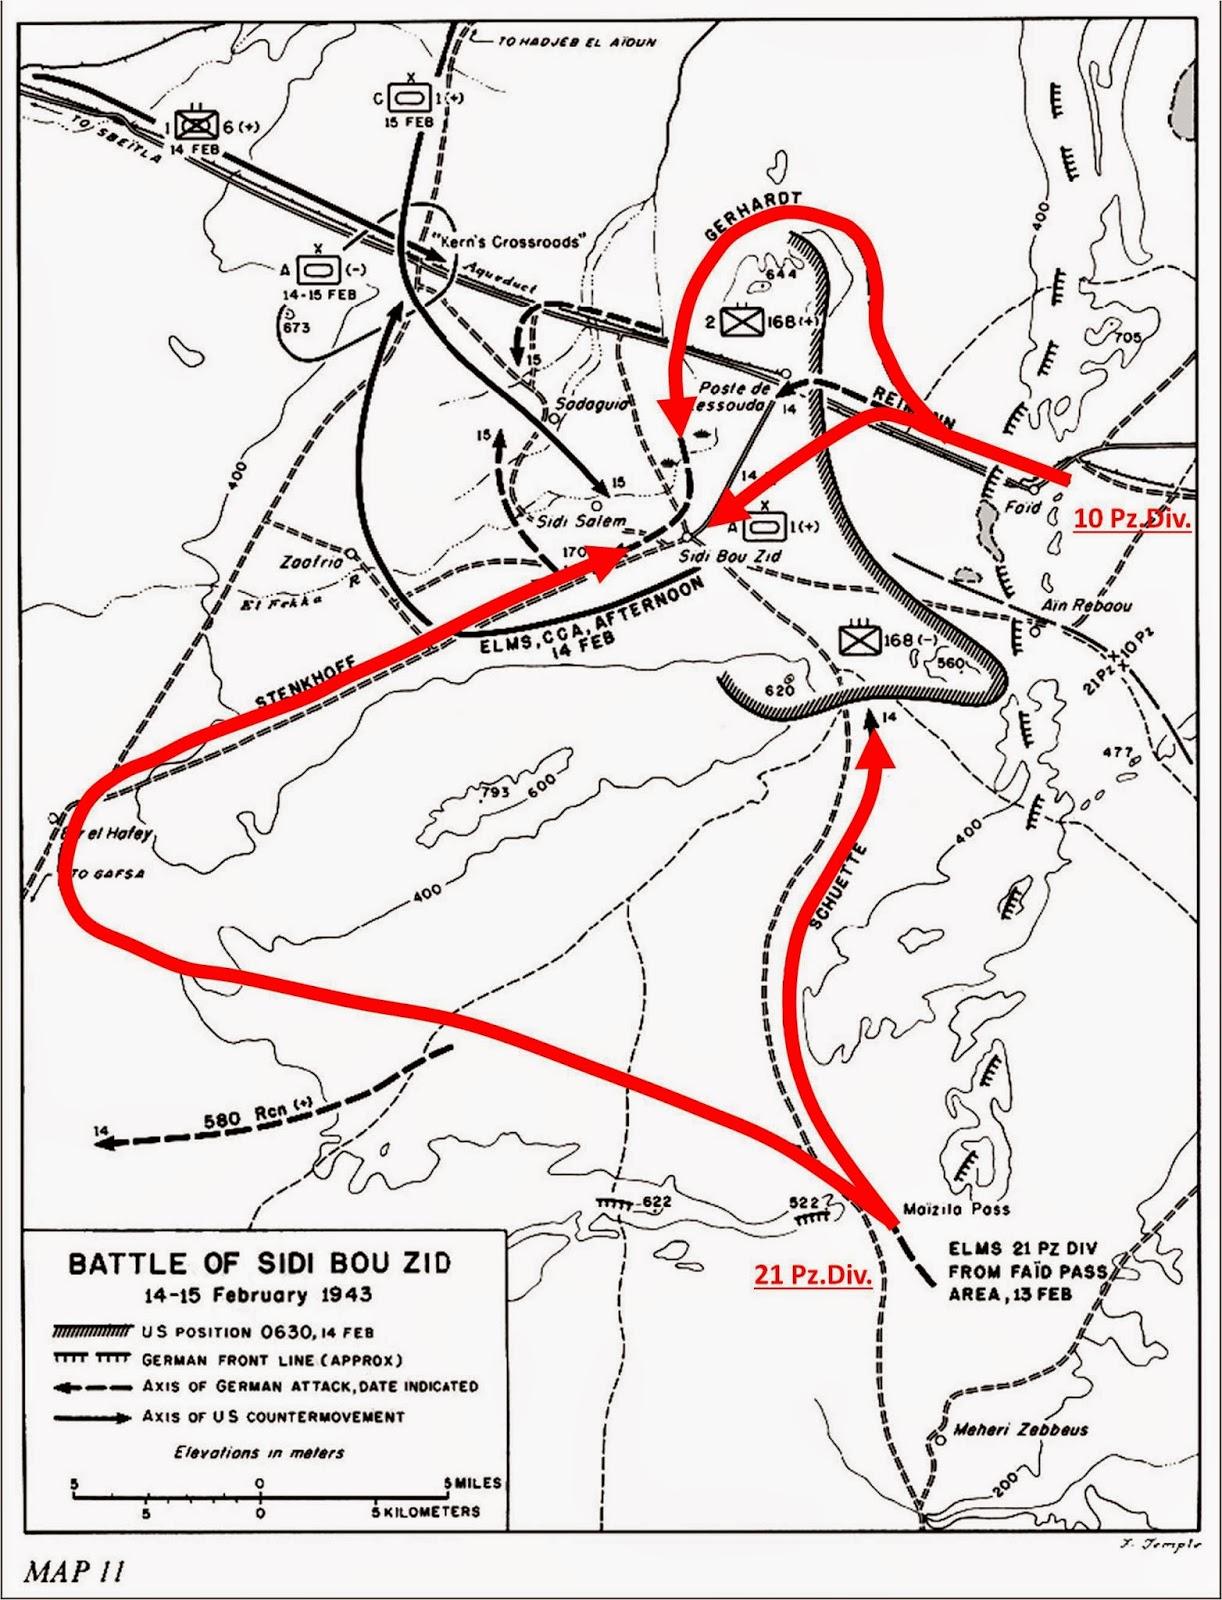 The battle of Sidi-Bou-Zid